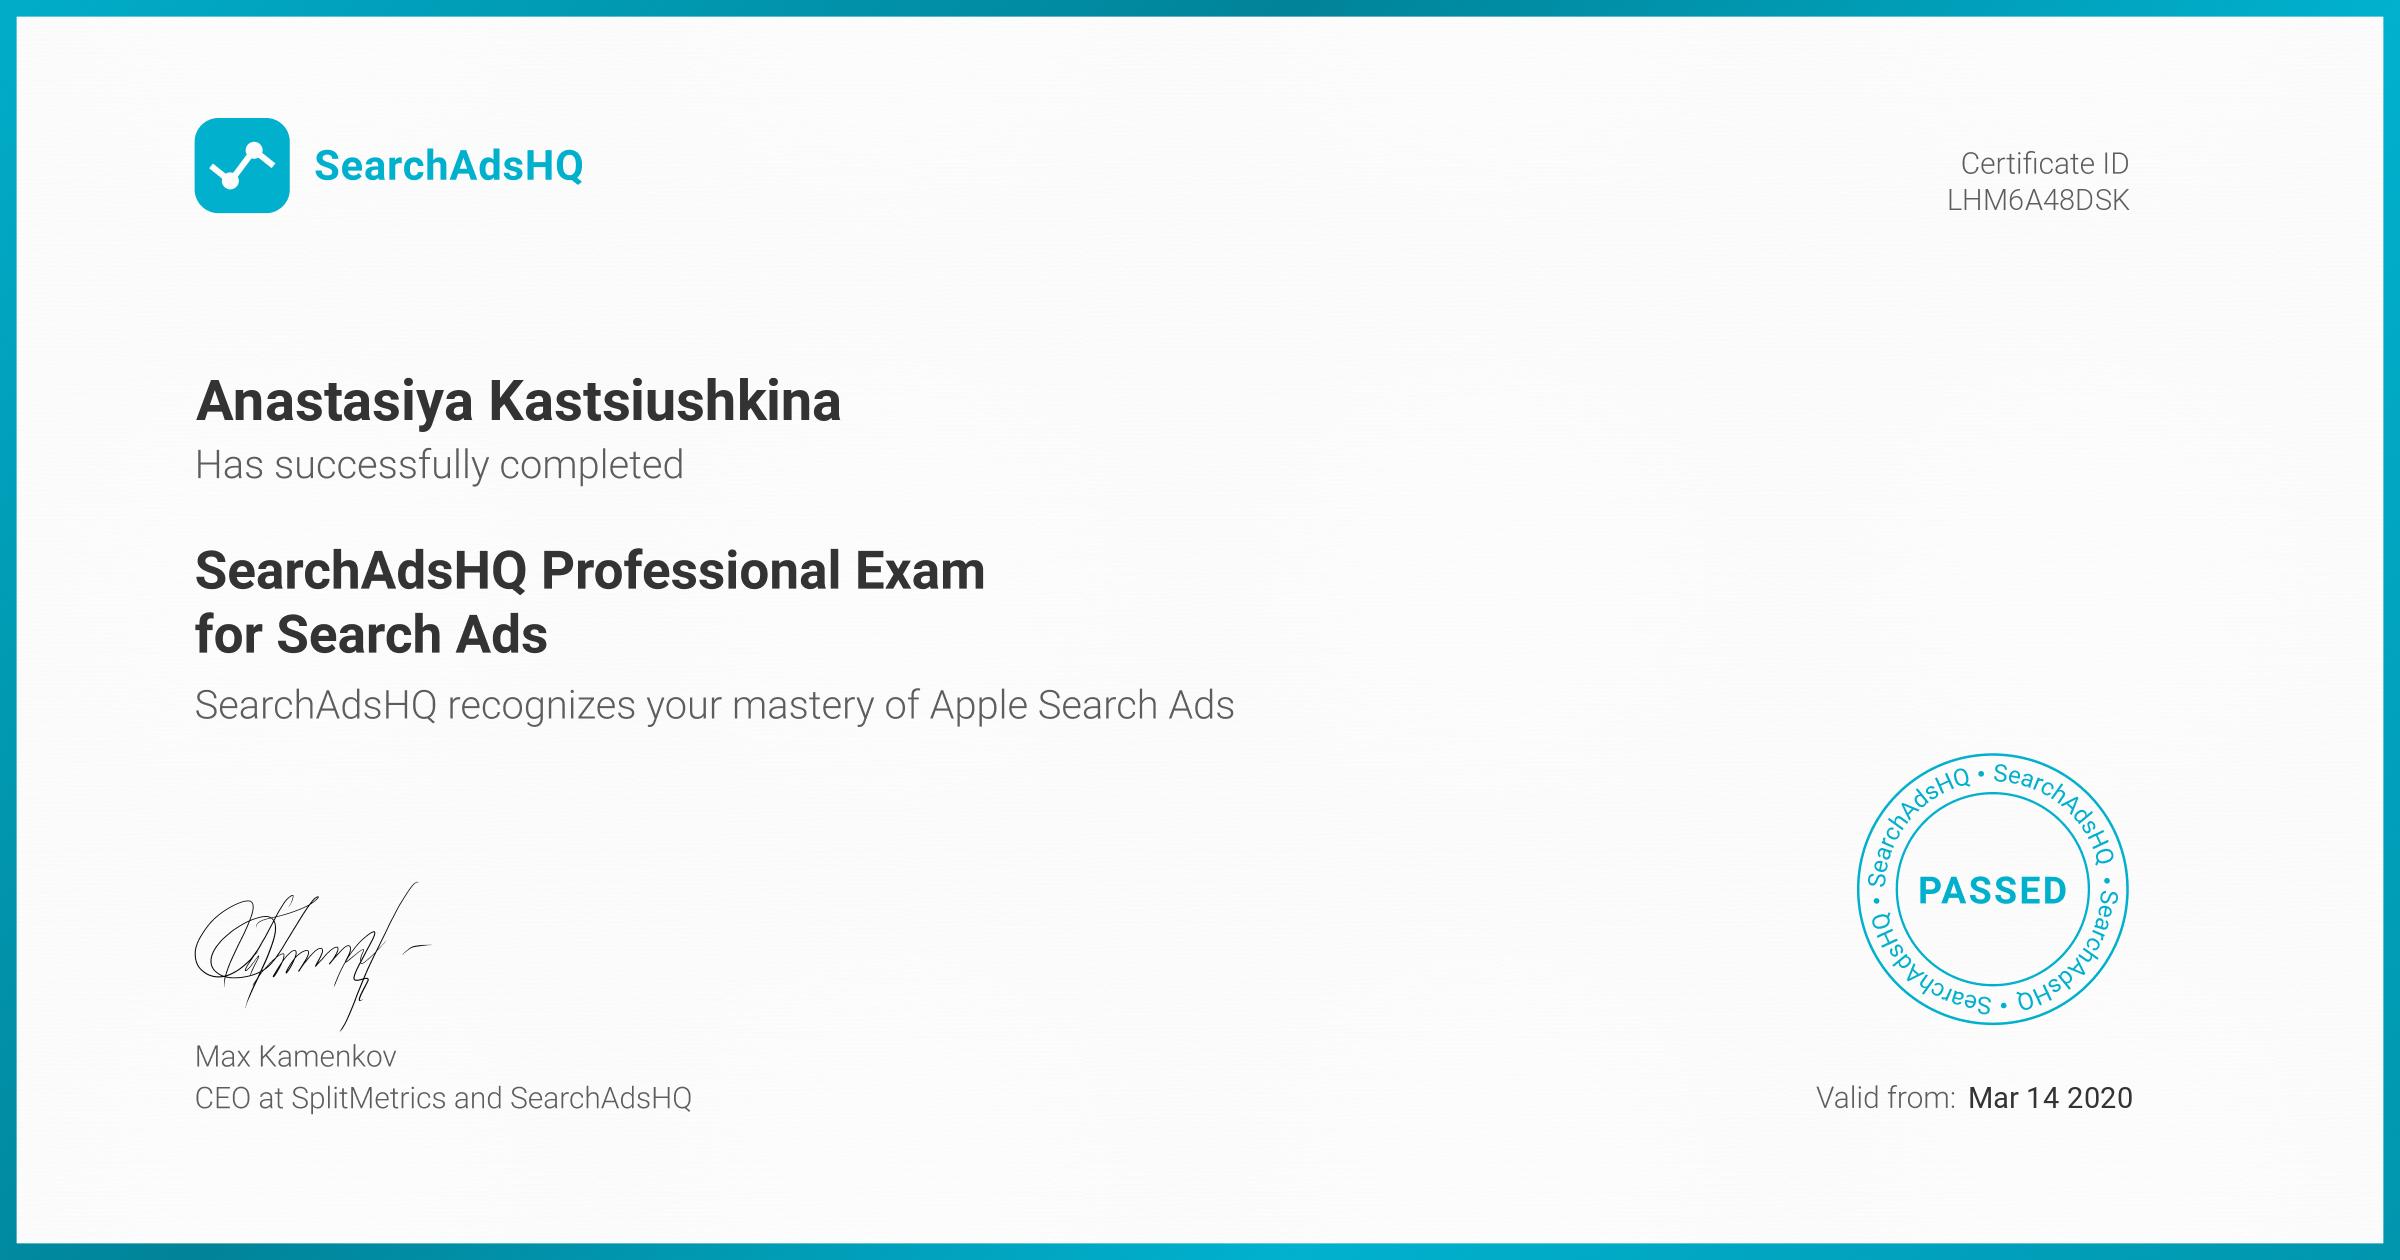 Certificate for Anastasiya Kastsiushkina | SearchAdsHQ Professional Exam for Search Ads